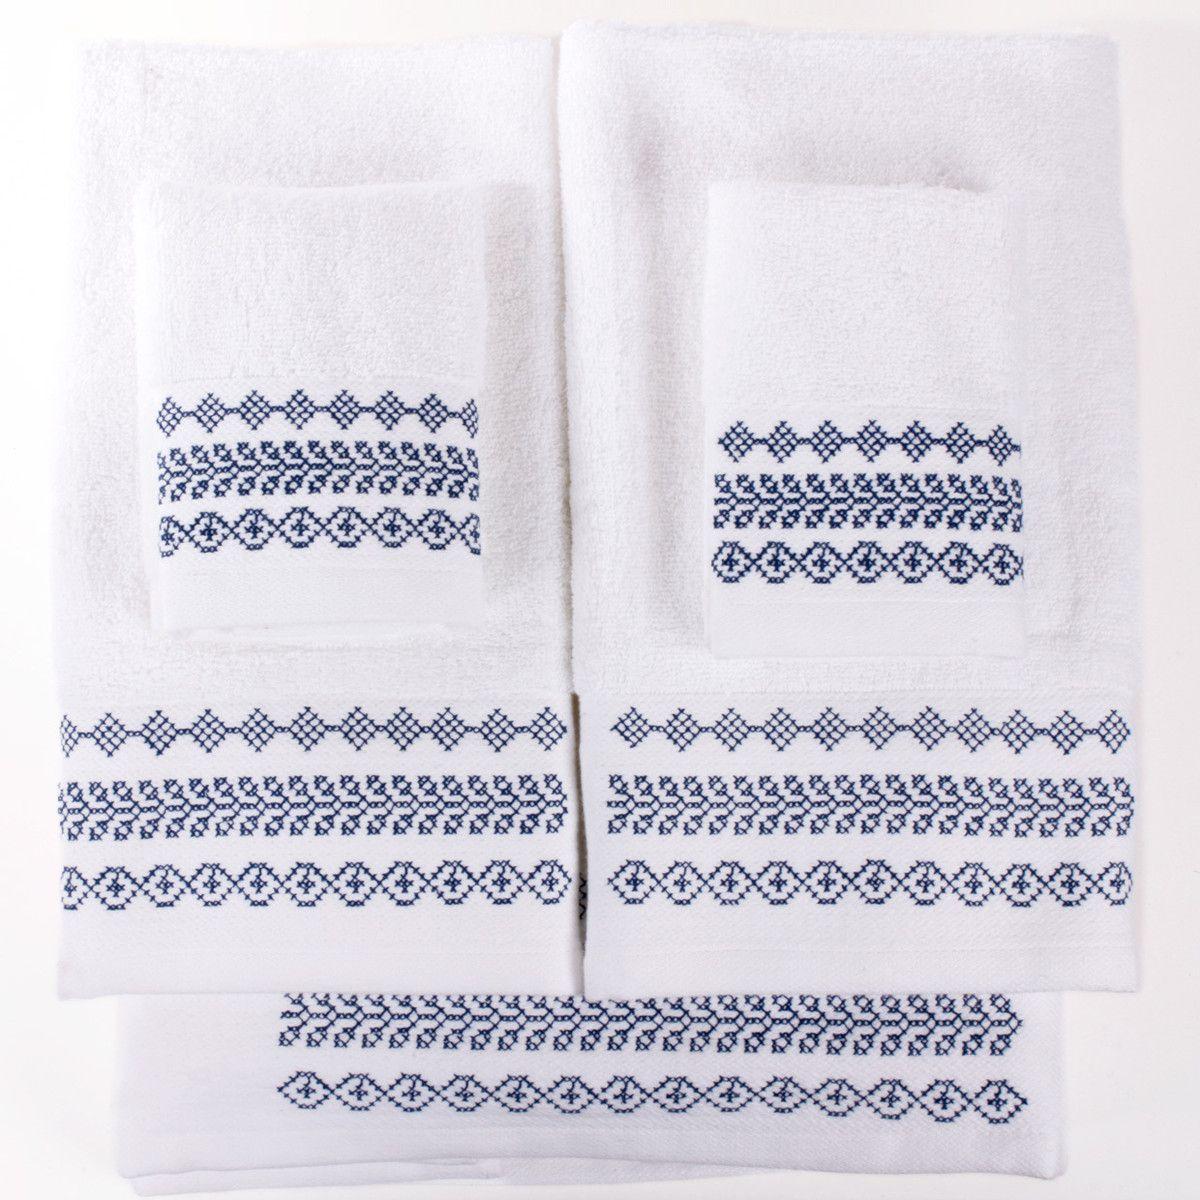 Badezimmer ideen blau fab  towel whiteblue set of six  embroidery  pinterest  haus